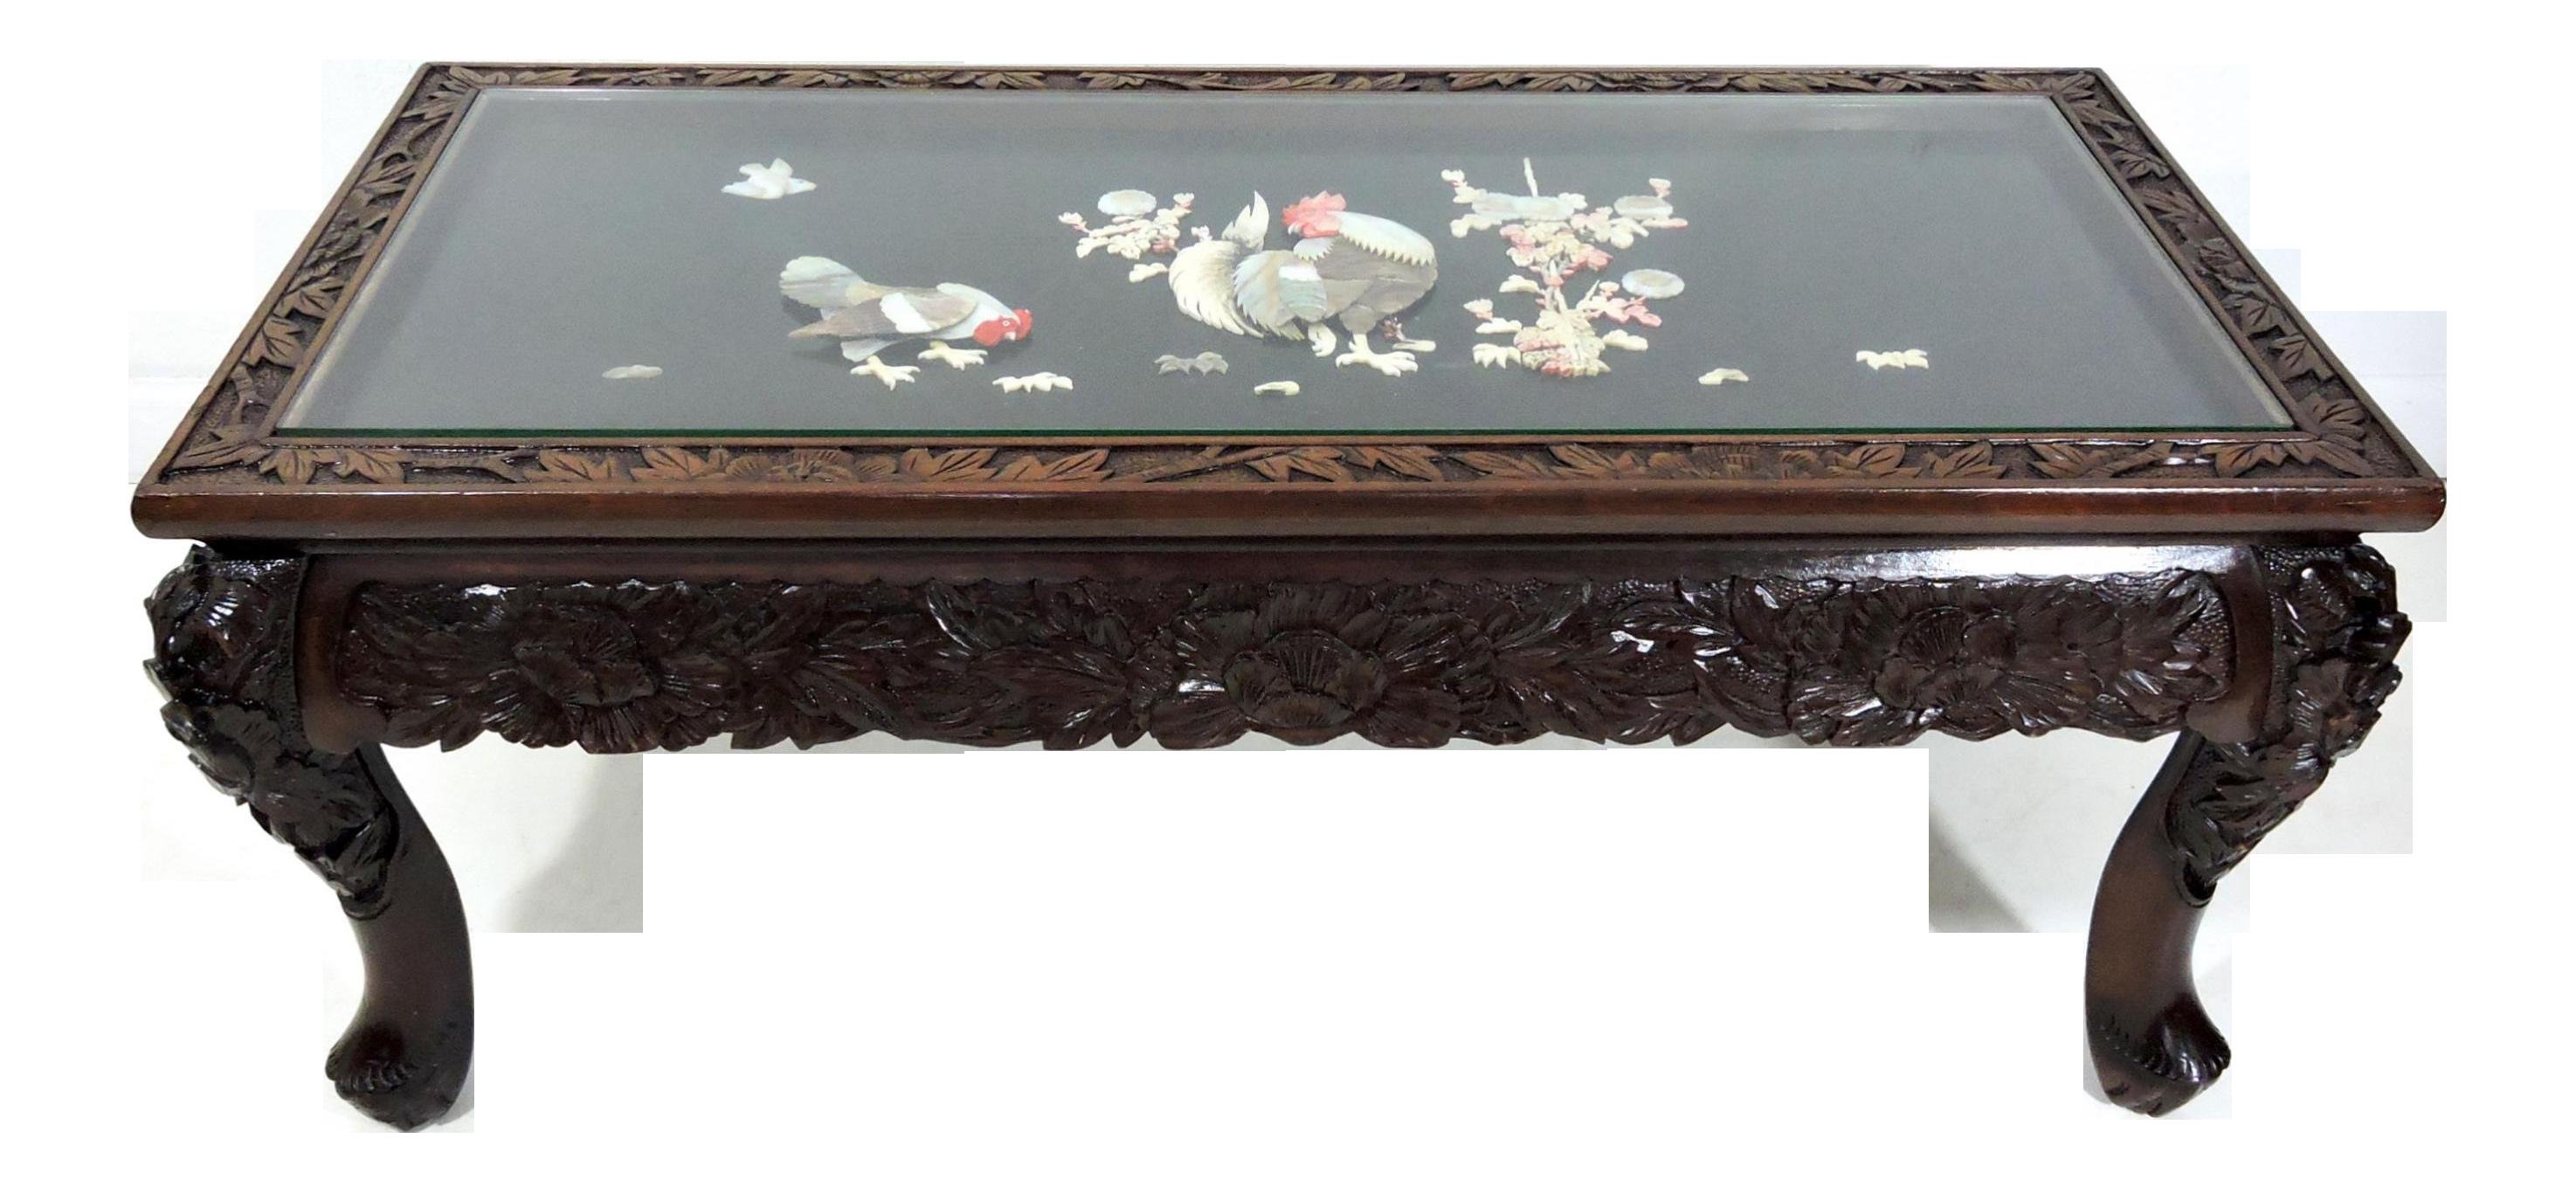 20th Century Japanese Lord Co Yokohama Glass Top Inlayed Coffee Table On Chairish Com Please Feel Free To Contact Us R Coffee Table Table Oriental Furniture [ 1366 x 2949 Pixel ]